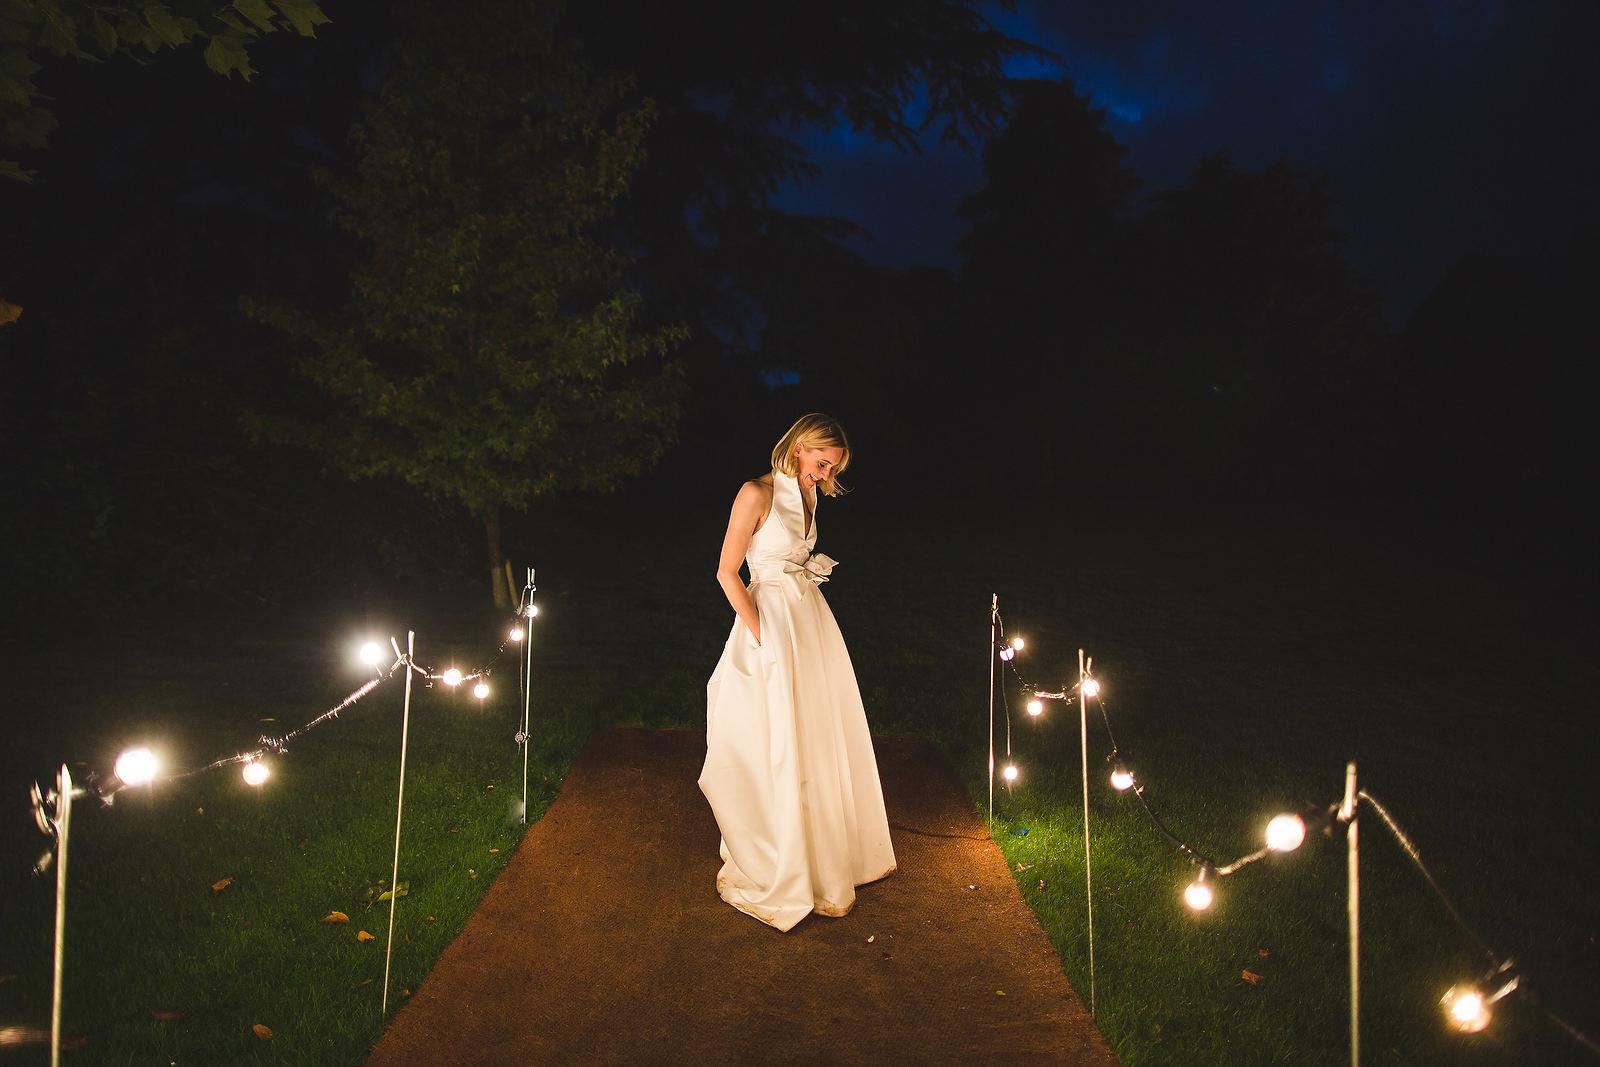 jesus piero wedding dress